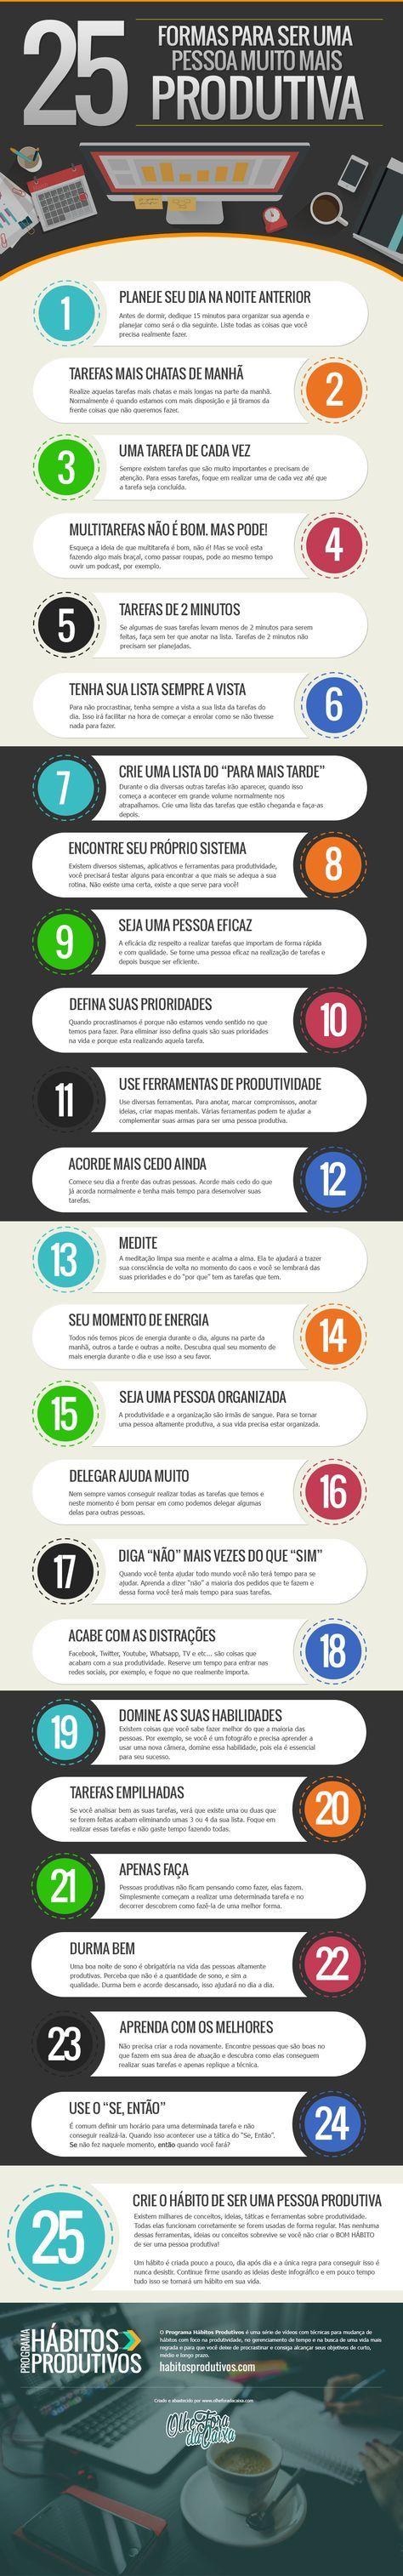 (8) - Entrada - Terra Mail - Message - tasj@terra.com.br